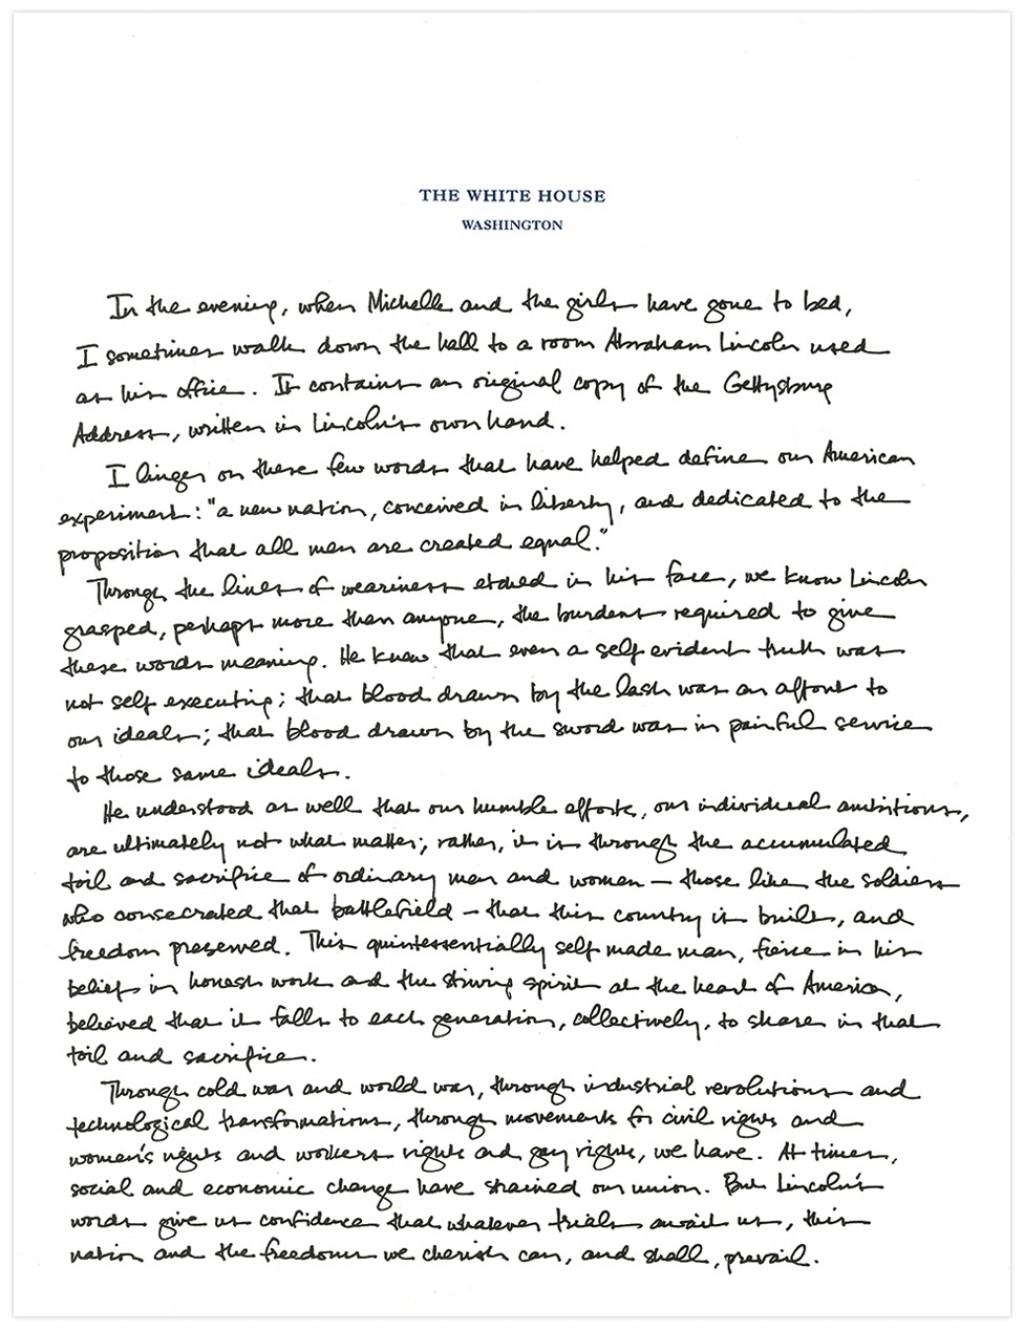 001 Obama Essay Potus Gettysburg Web 2013 Marvelous President Research Paper Barack Pdf Michelle Large